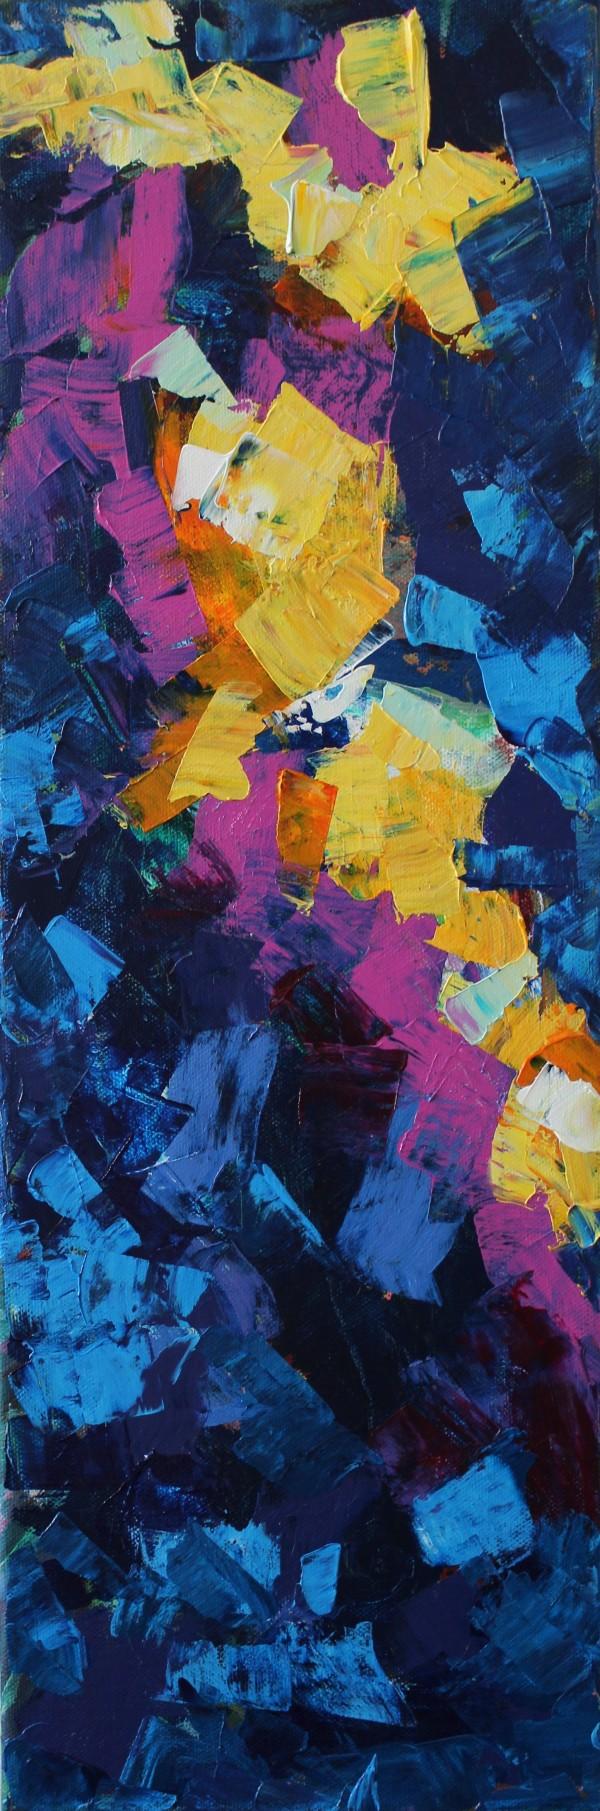 Path of Light by Sonya Kleshik